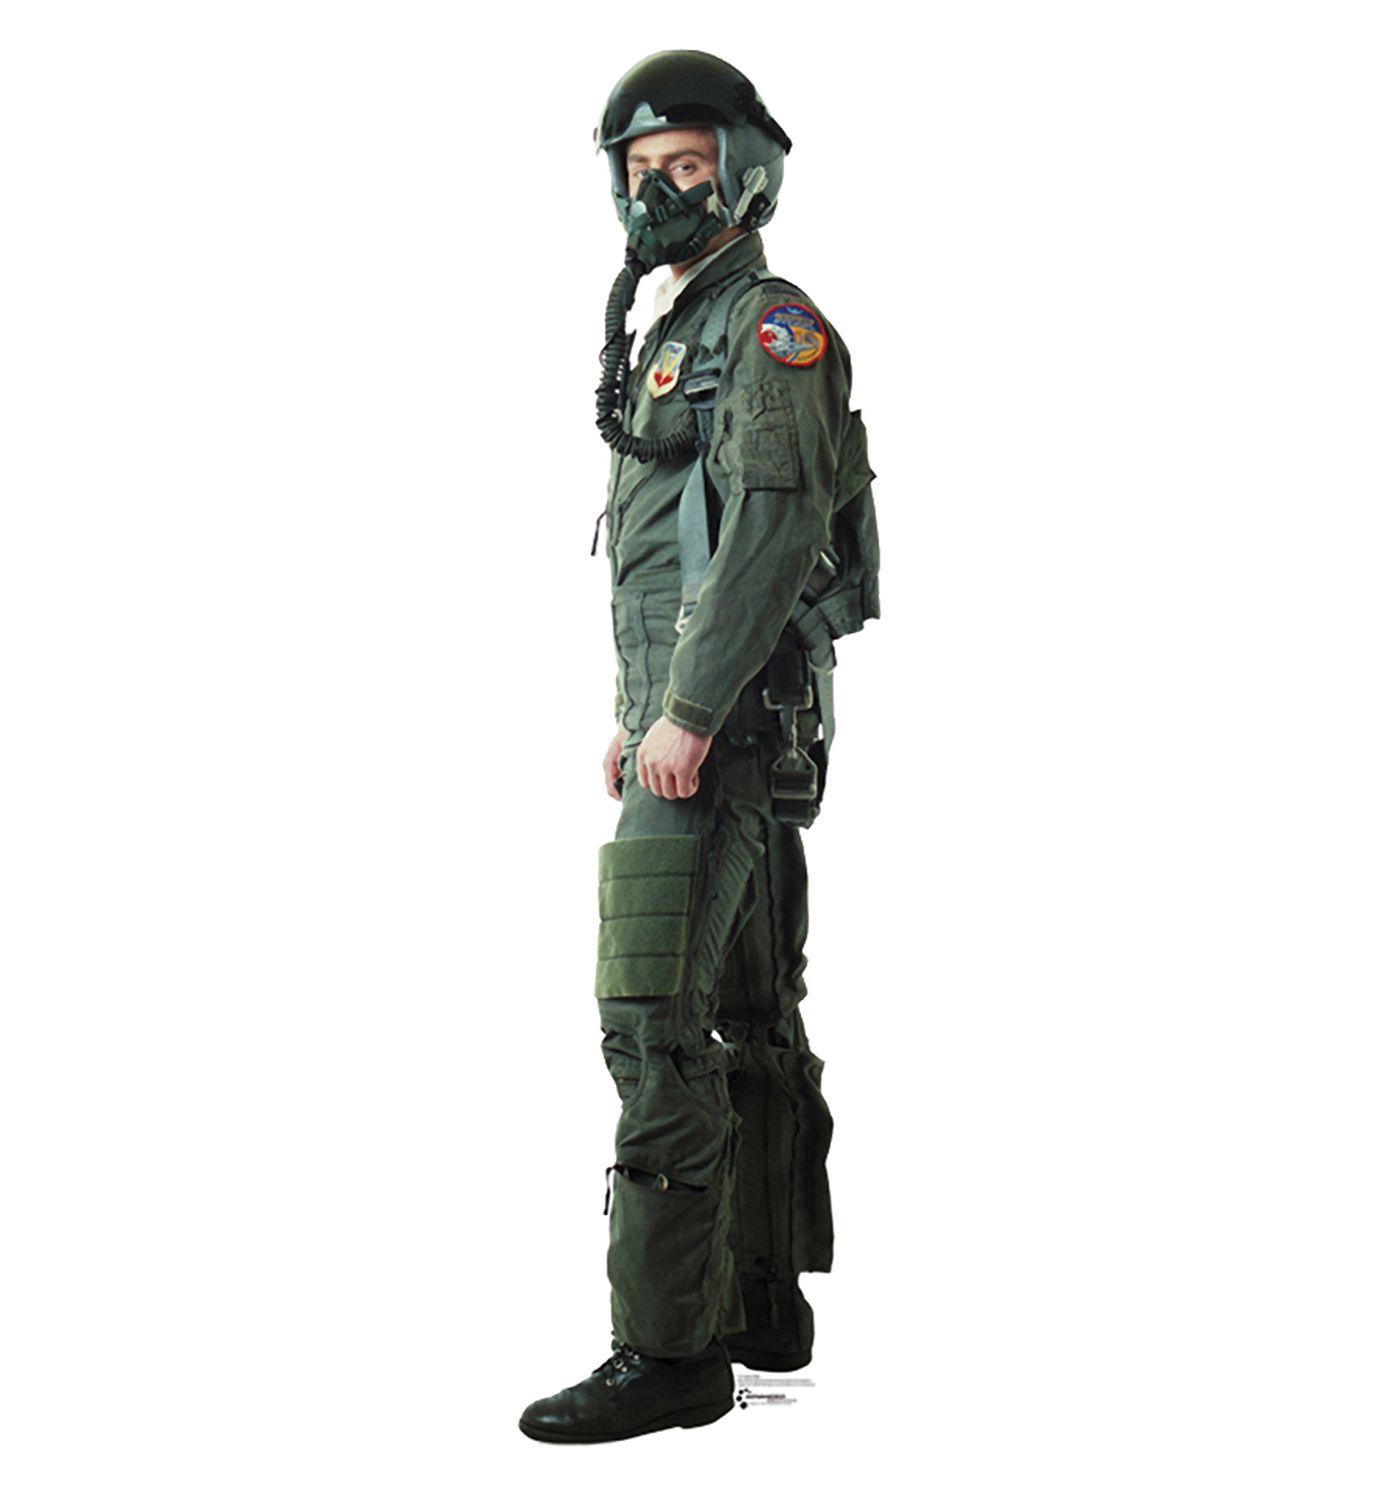 Fighter Pilot Cardboard Cutout Fighter Pilot Air Force Us Fighter Jets